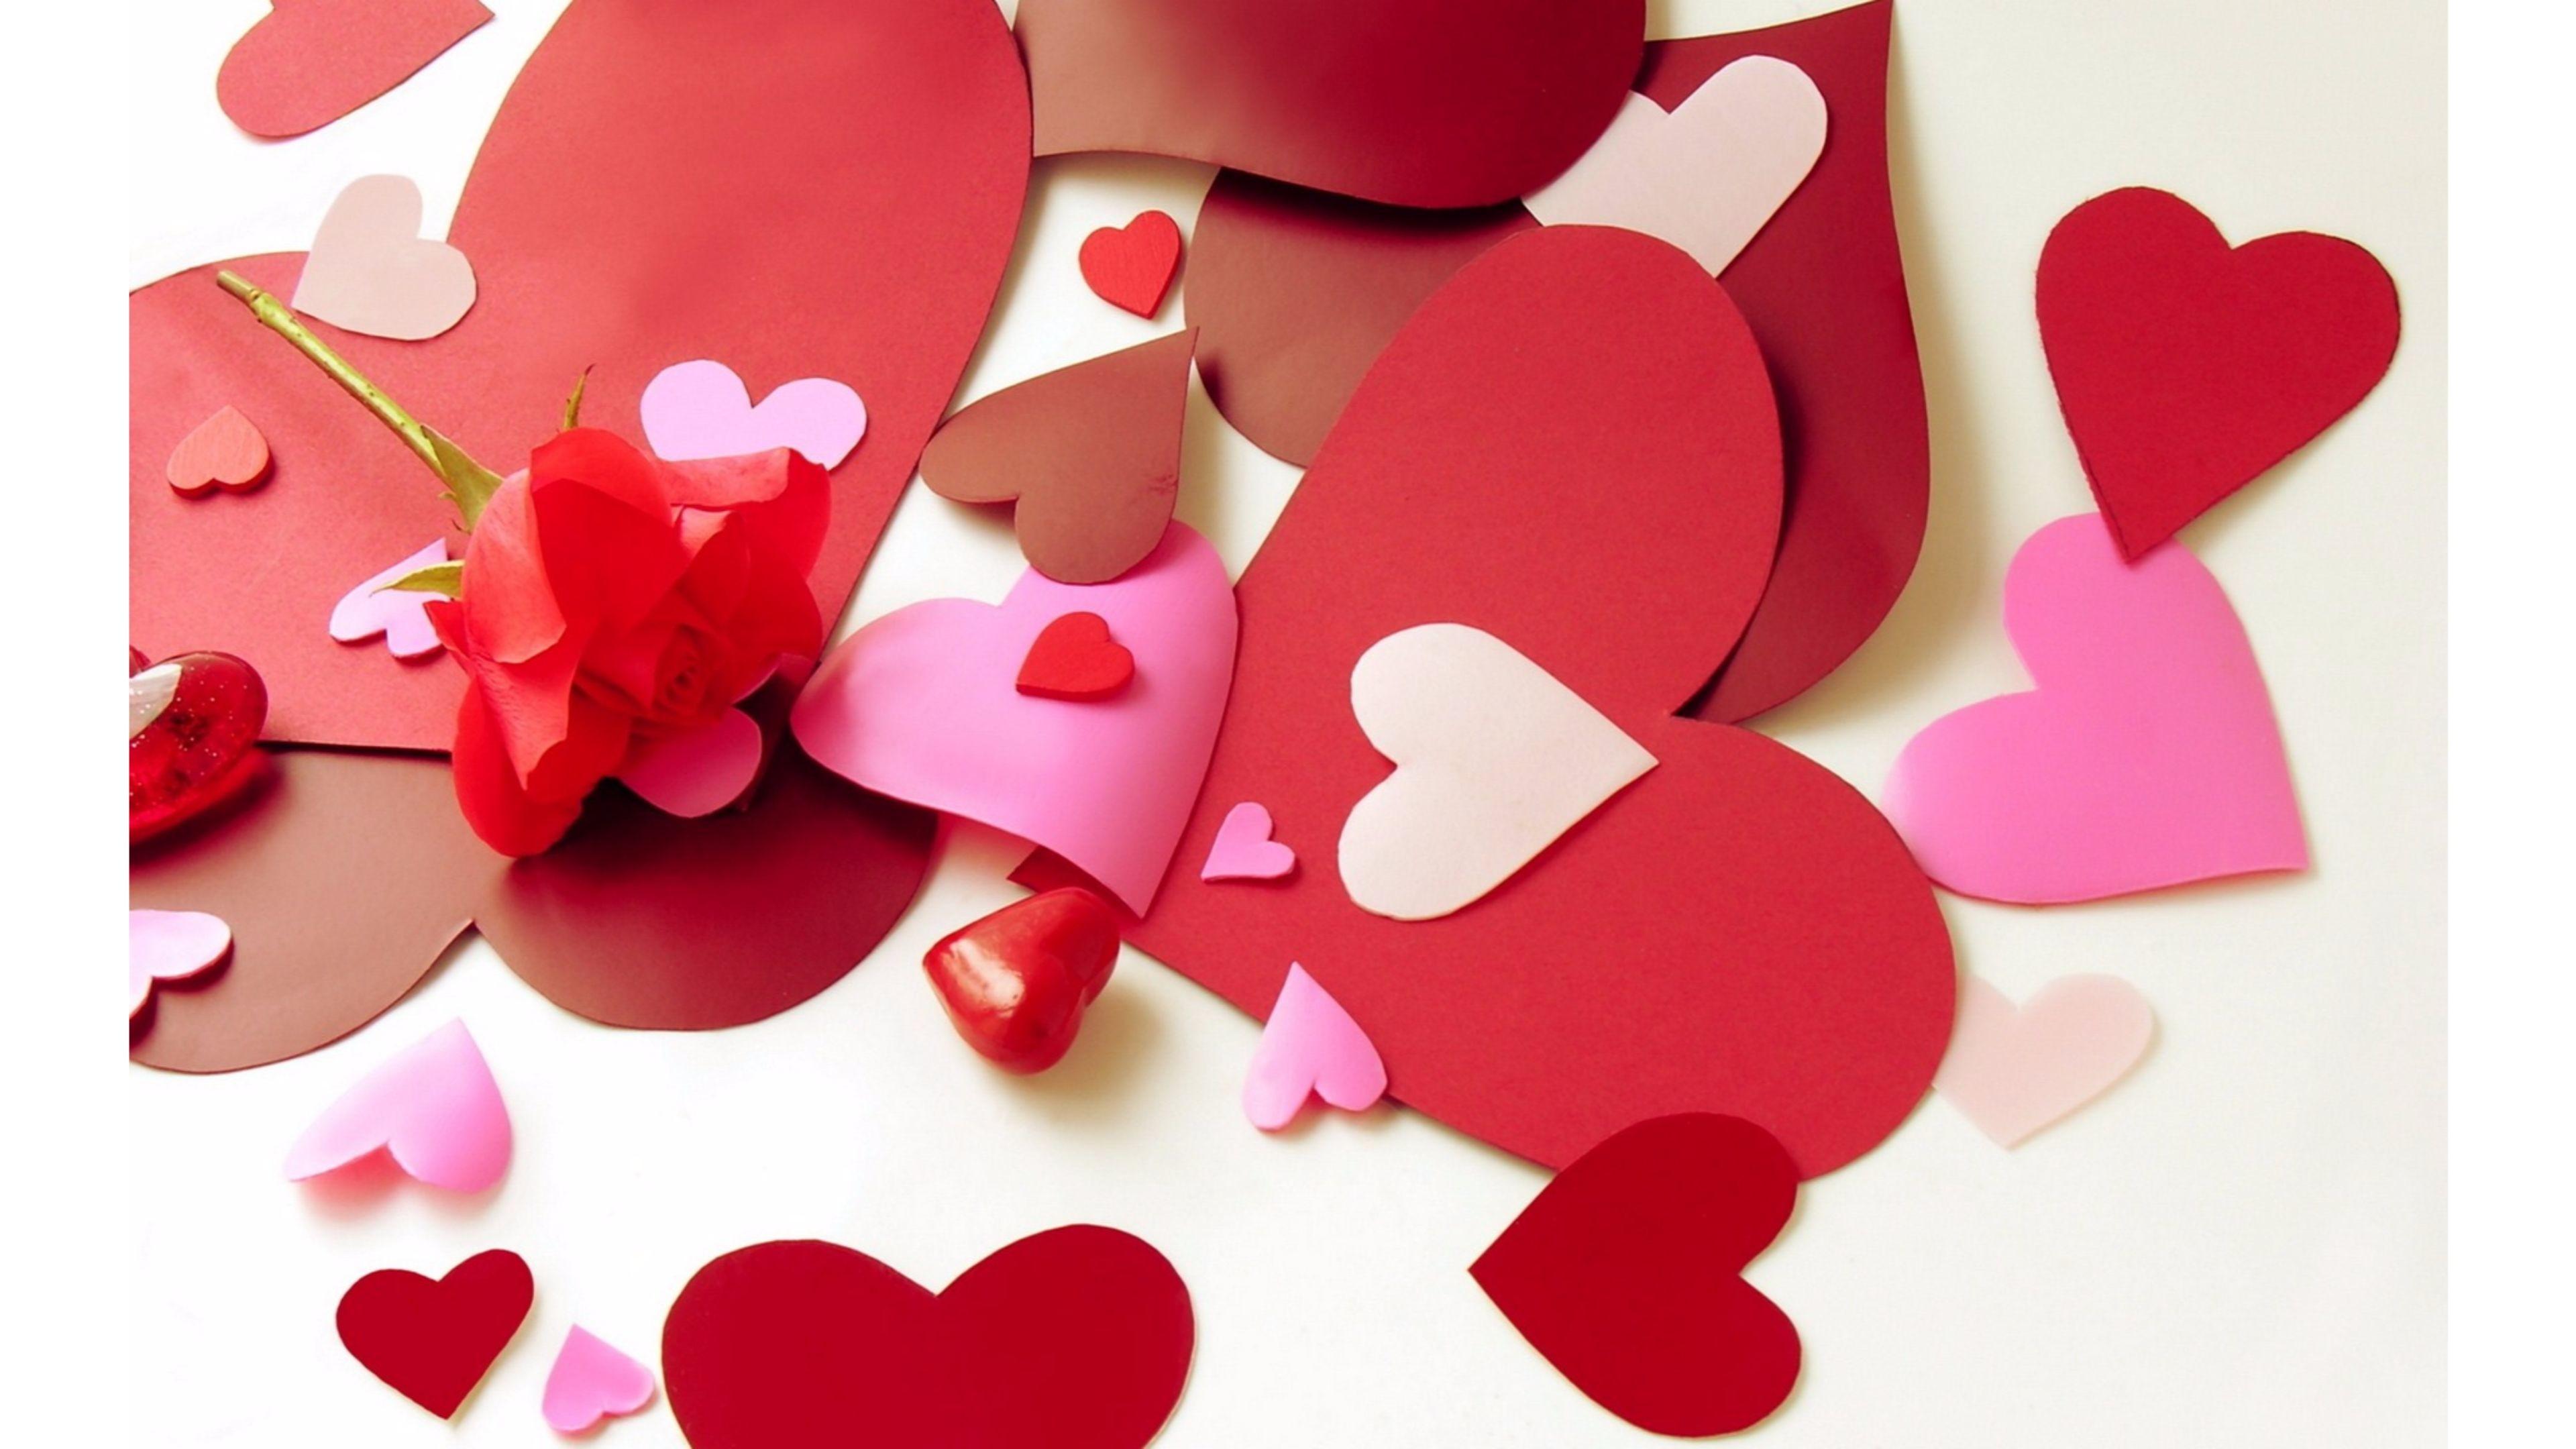 Love Heart Wallpaper Hd Wallpapertag: Hearts Love Wallpapers ·① WallpaperTag